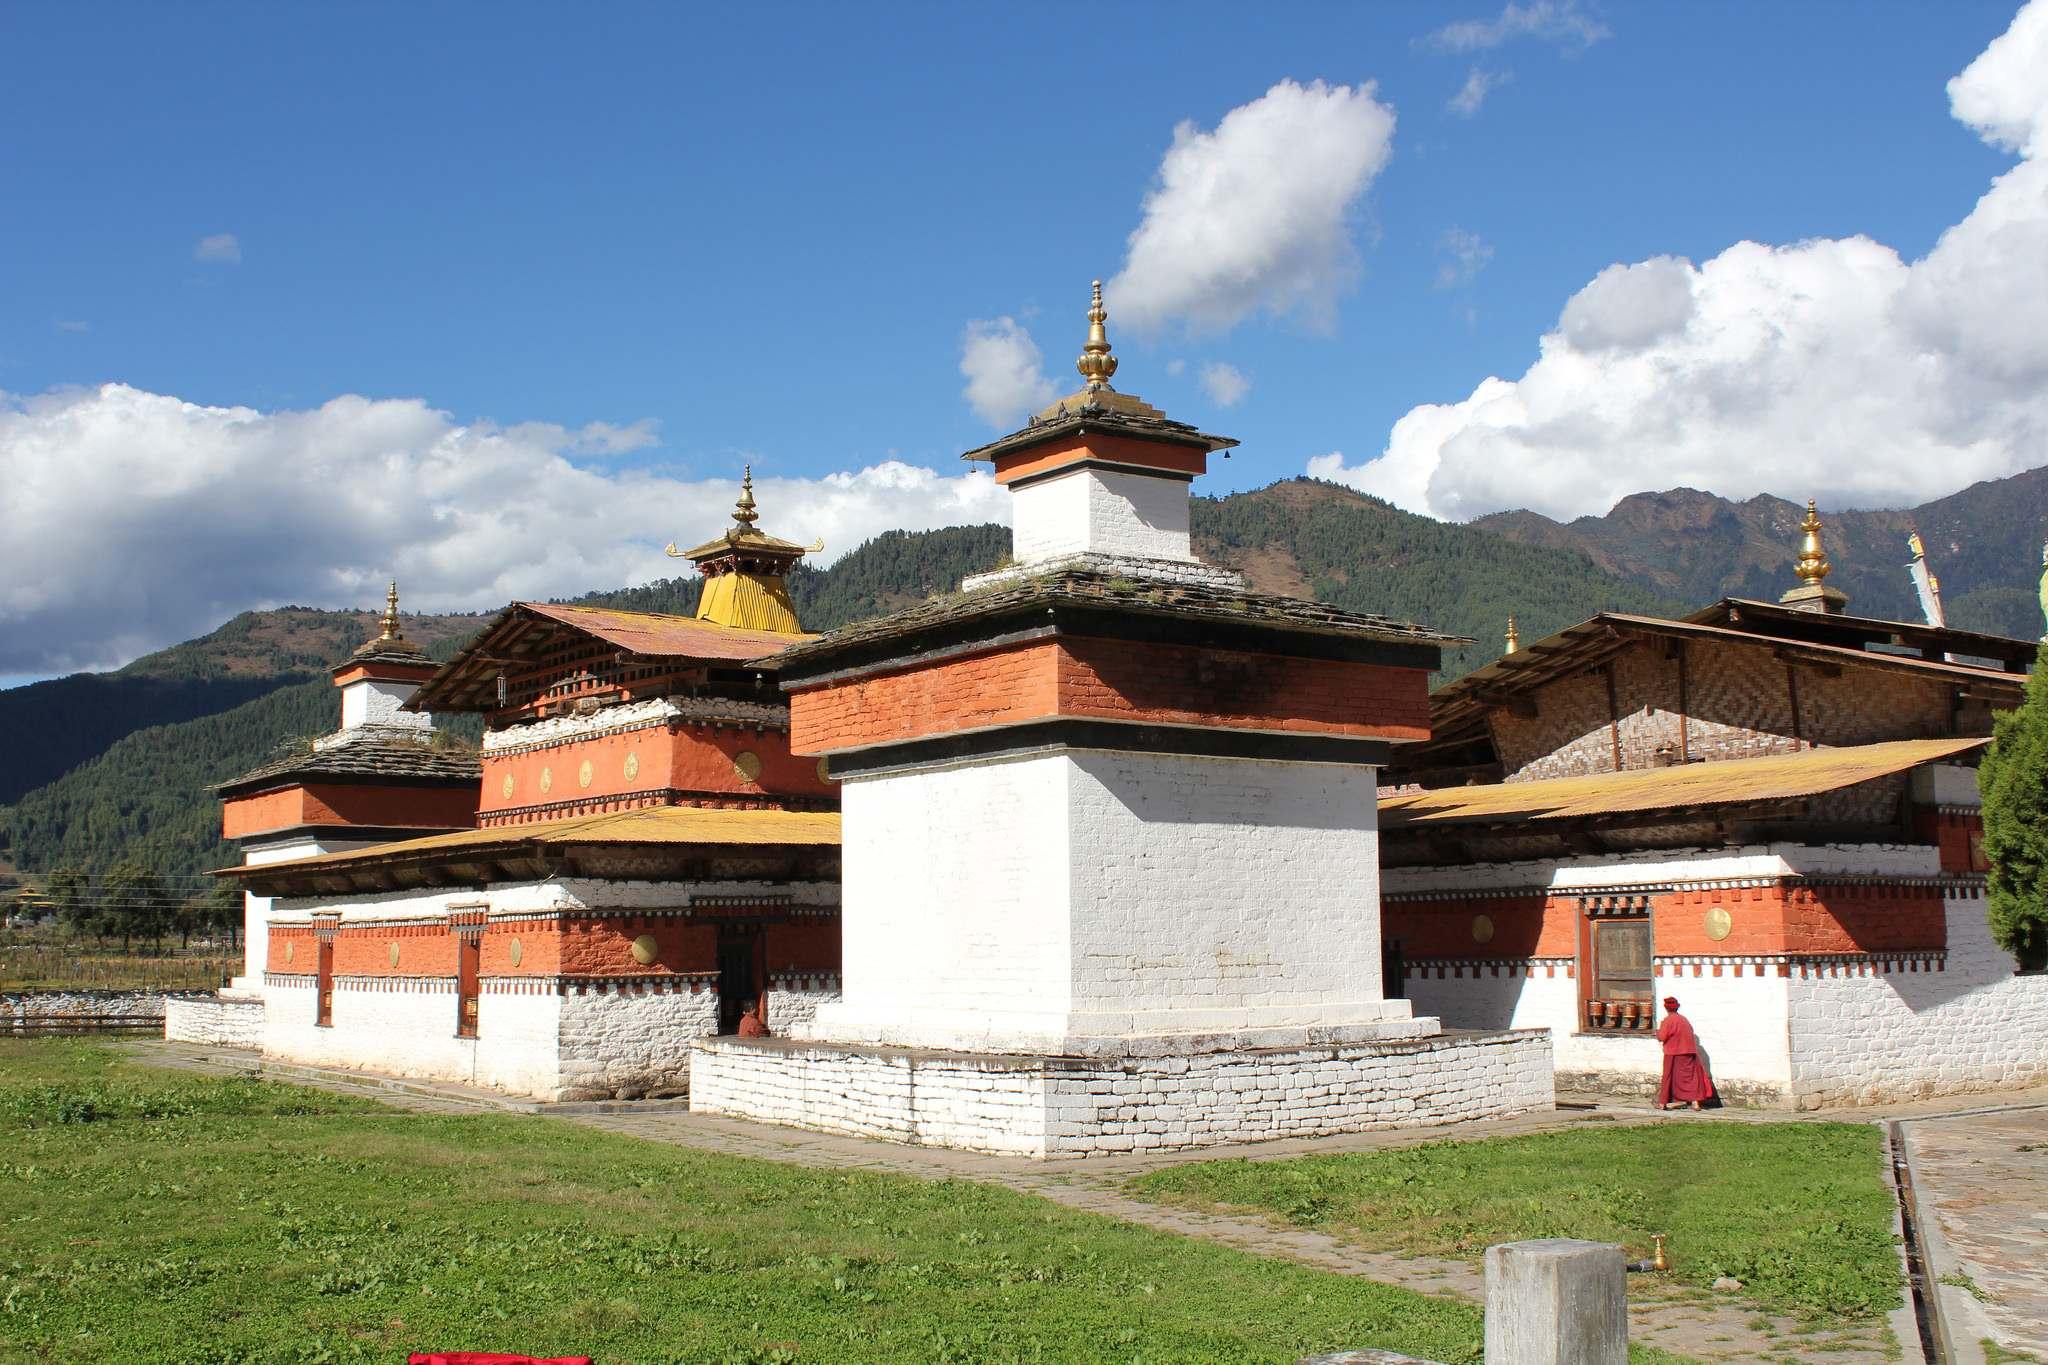 bhutan10 Bhutan   The Land of the Thunder Dragon